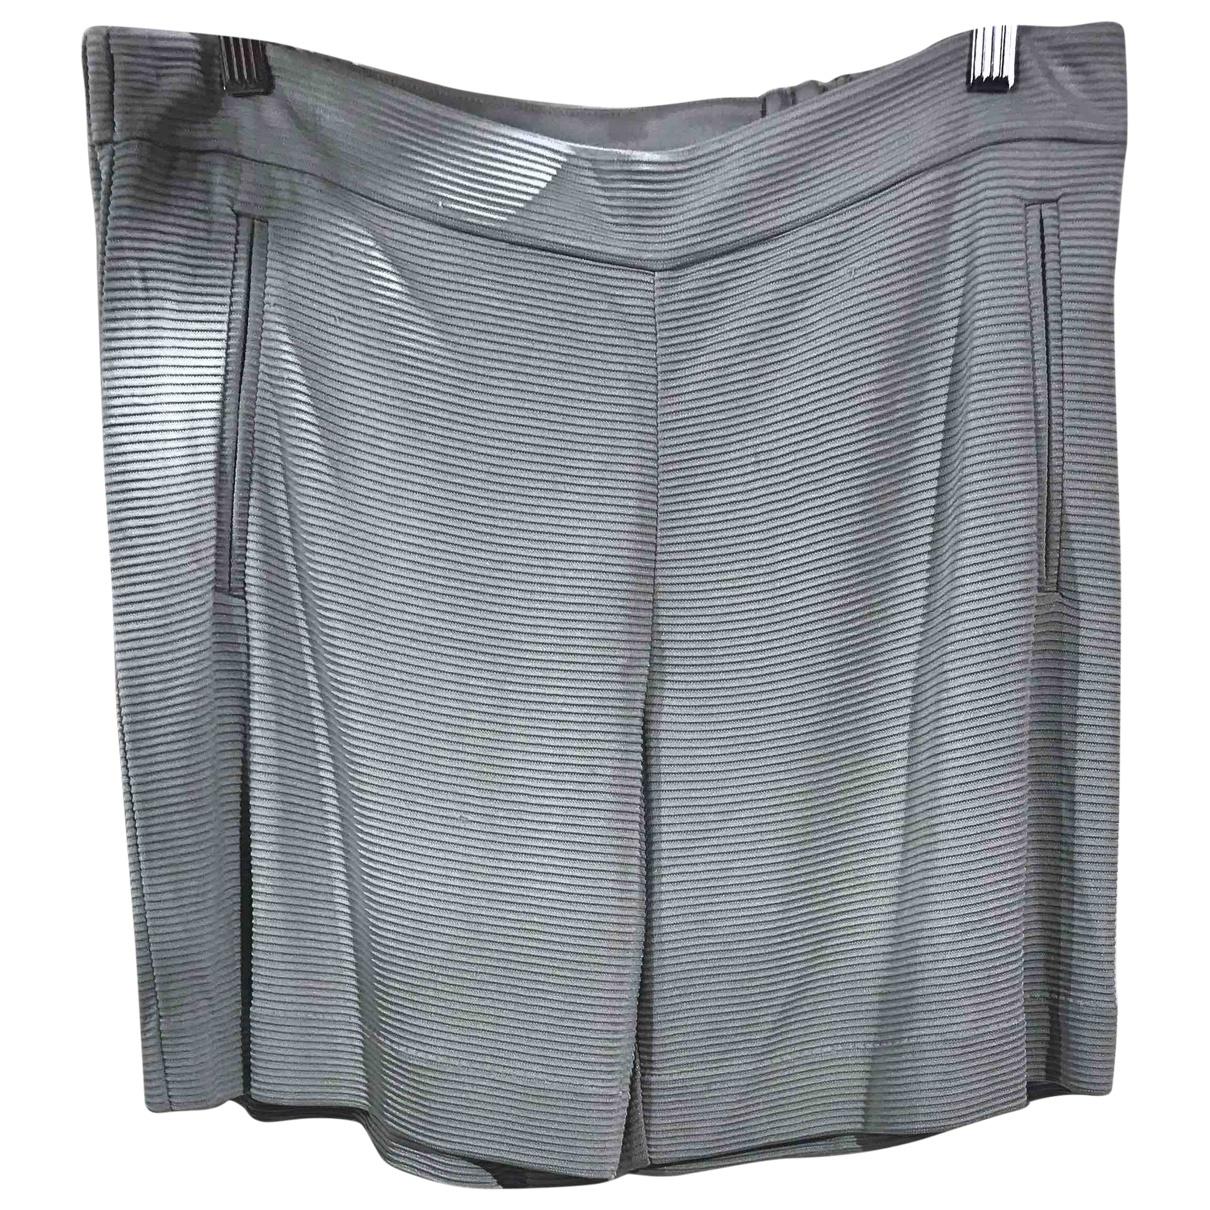 Emporio Armani \N Grey Shorts for Women 44 IT